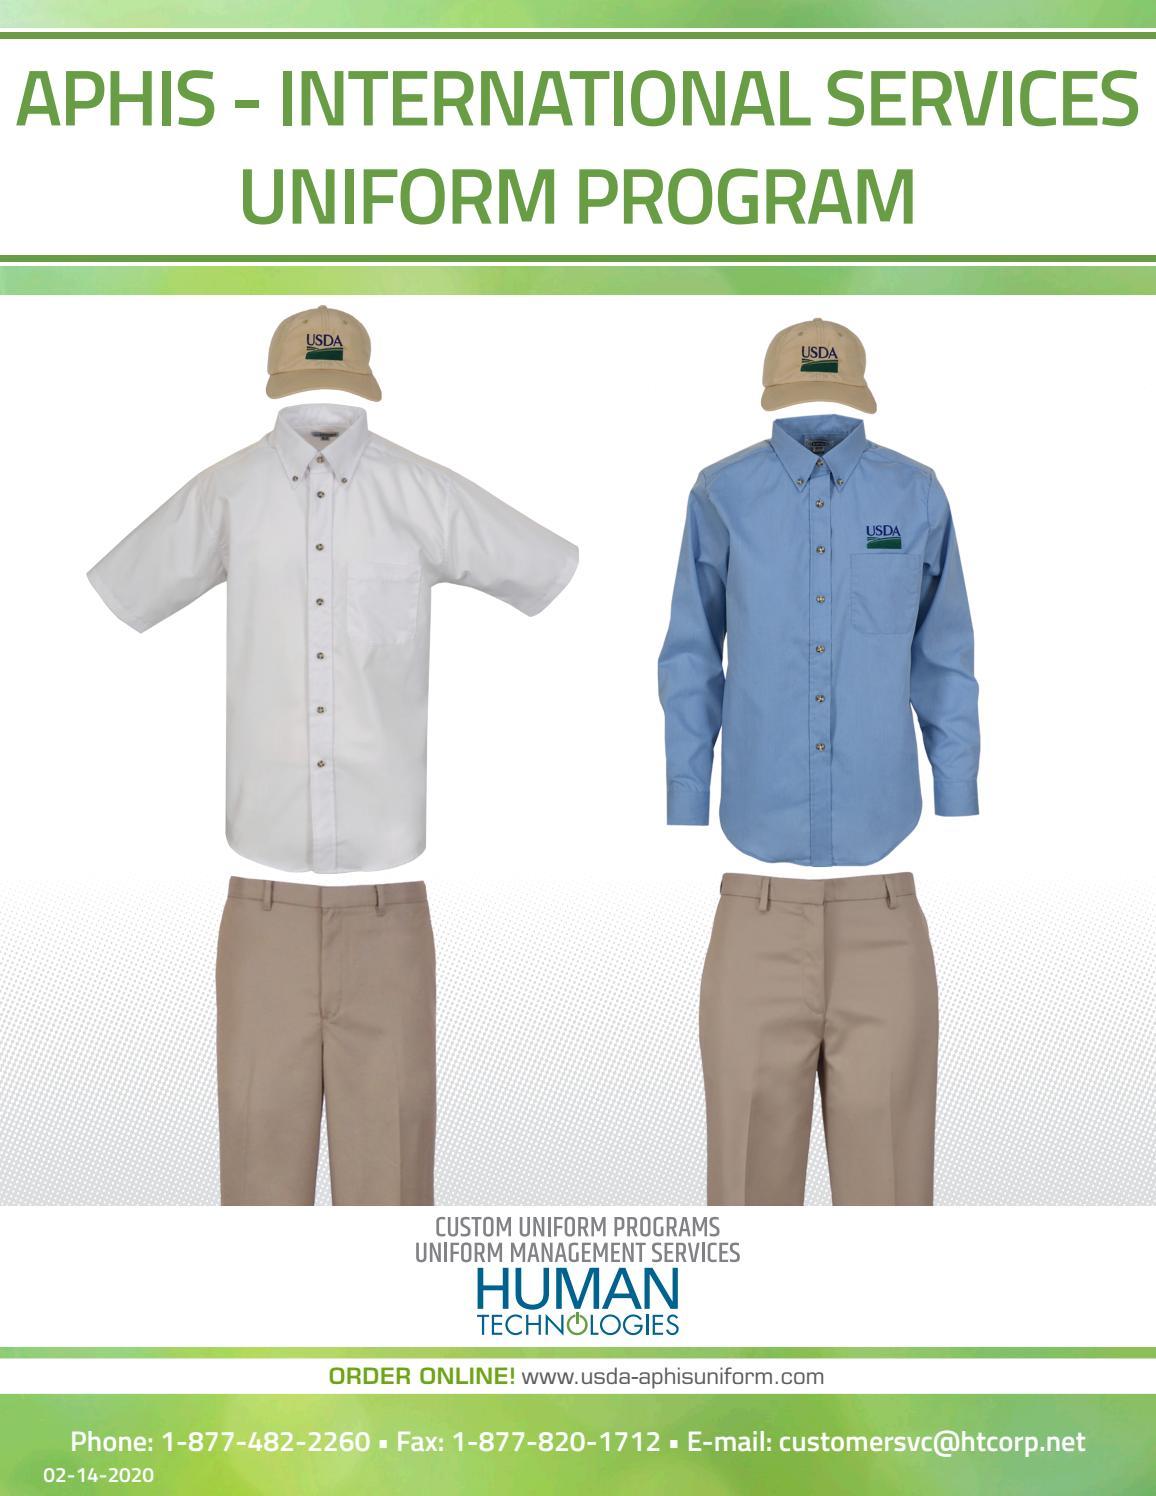 NOS USPS white button up short sleeve uniform shirt w logo 17.5 50 in chest XL